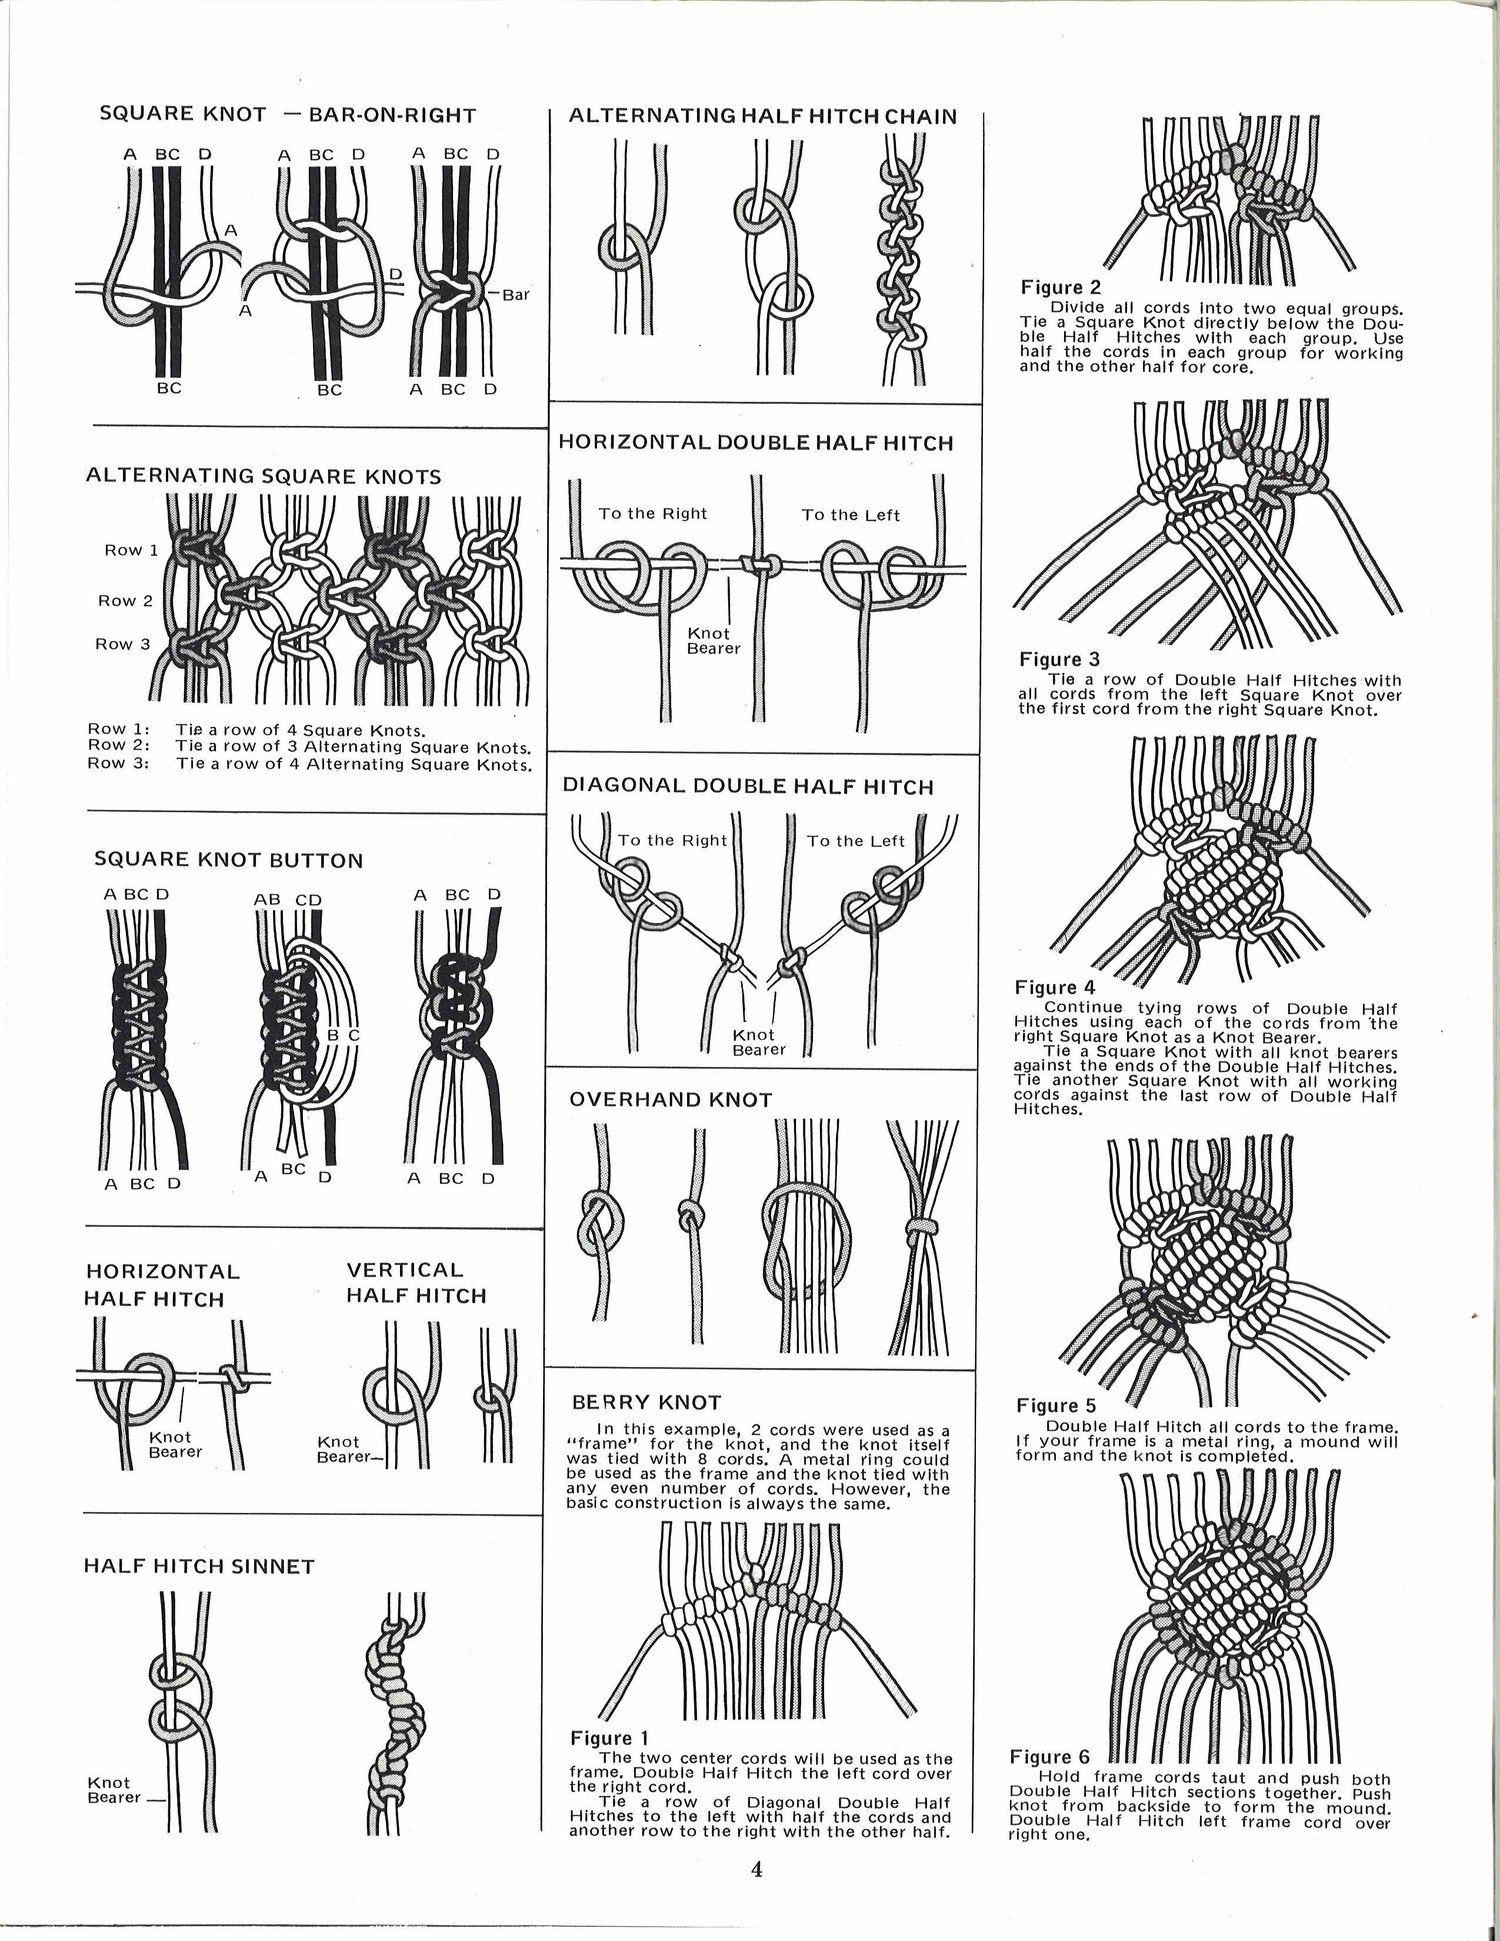 Easy Macrame \u2022 1970s Macram\u00e9 Pot Hangers \u2022 How To Instruction Pattern Book \u2022 70s Vintage Plant Hanger \u2022 Retro Book PDF